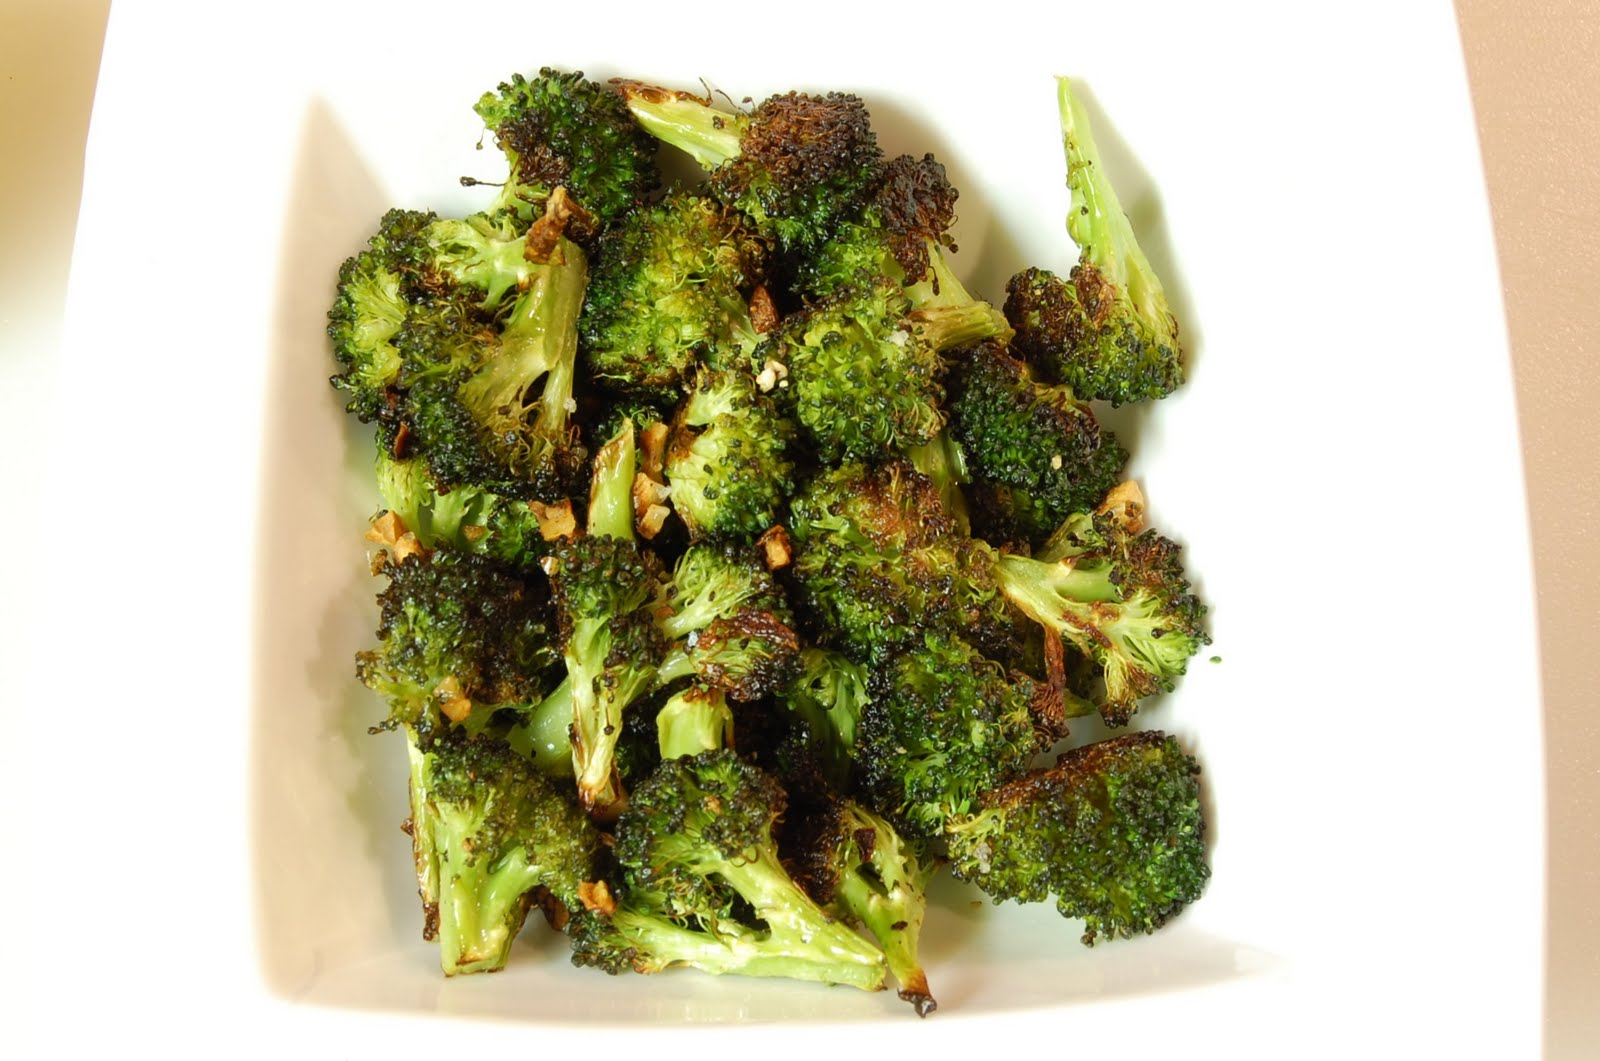 garlic lemon broccoli recipe yummly roasted garlic lemon broccoli ...